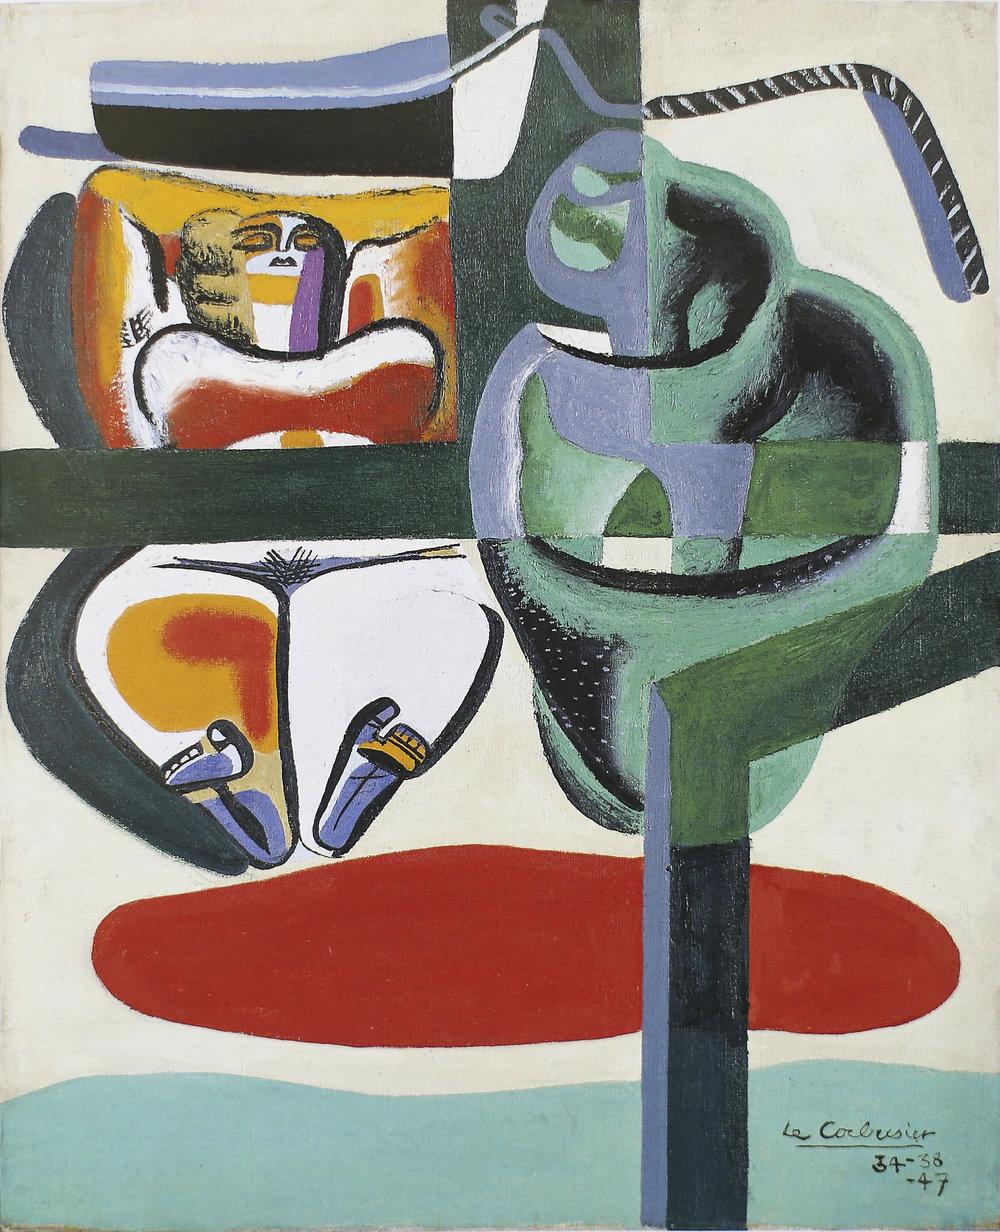 Le Corbusier, Baigneuse, barque et coquillage.  The Foundation Le Corbusier © FLCADGAP